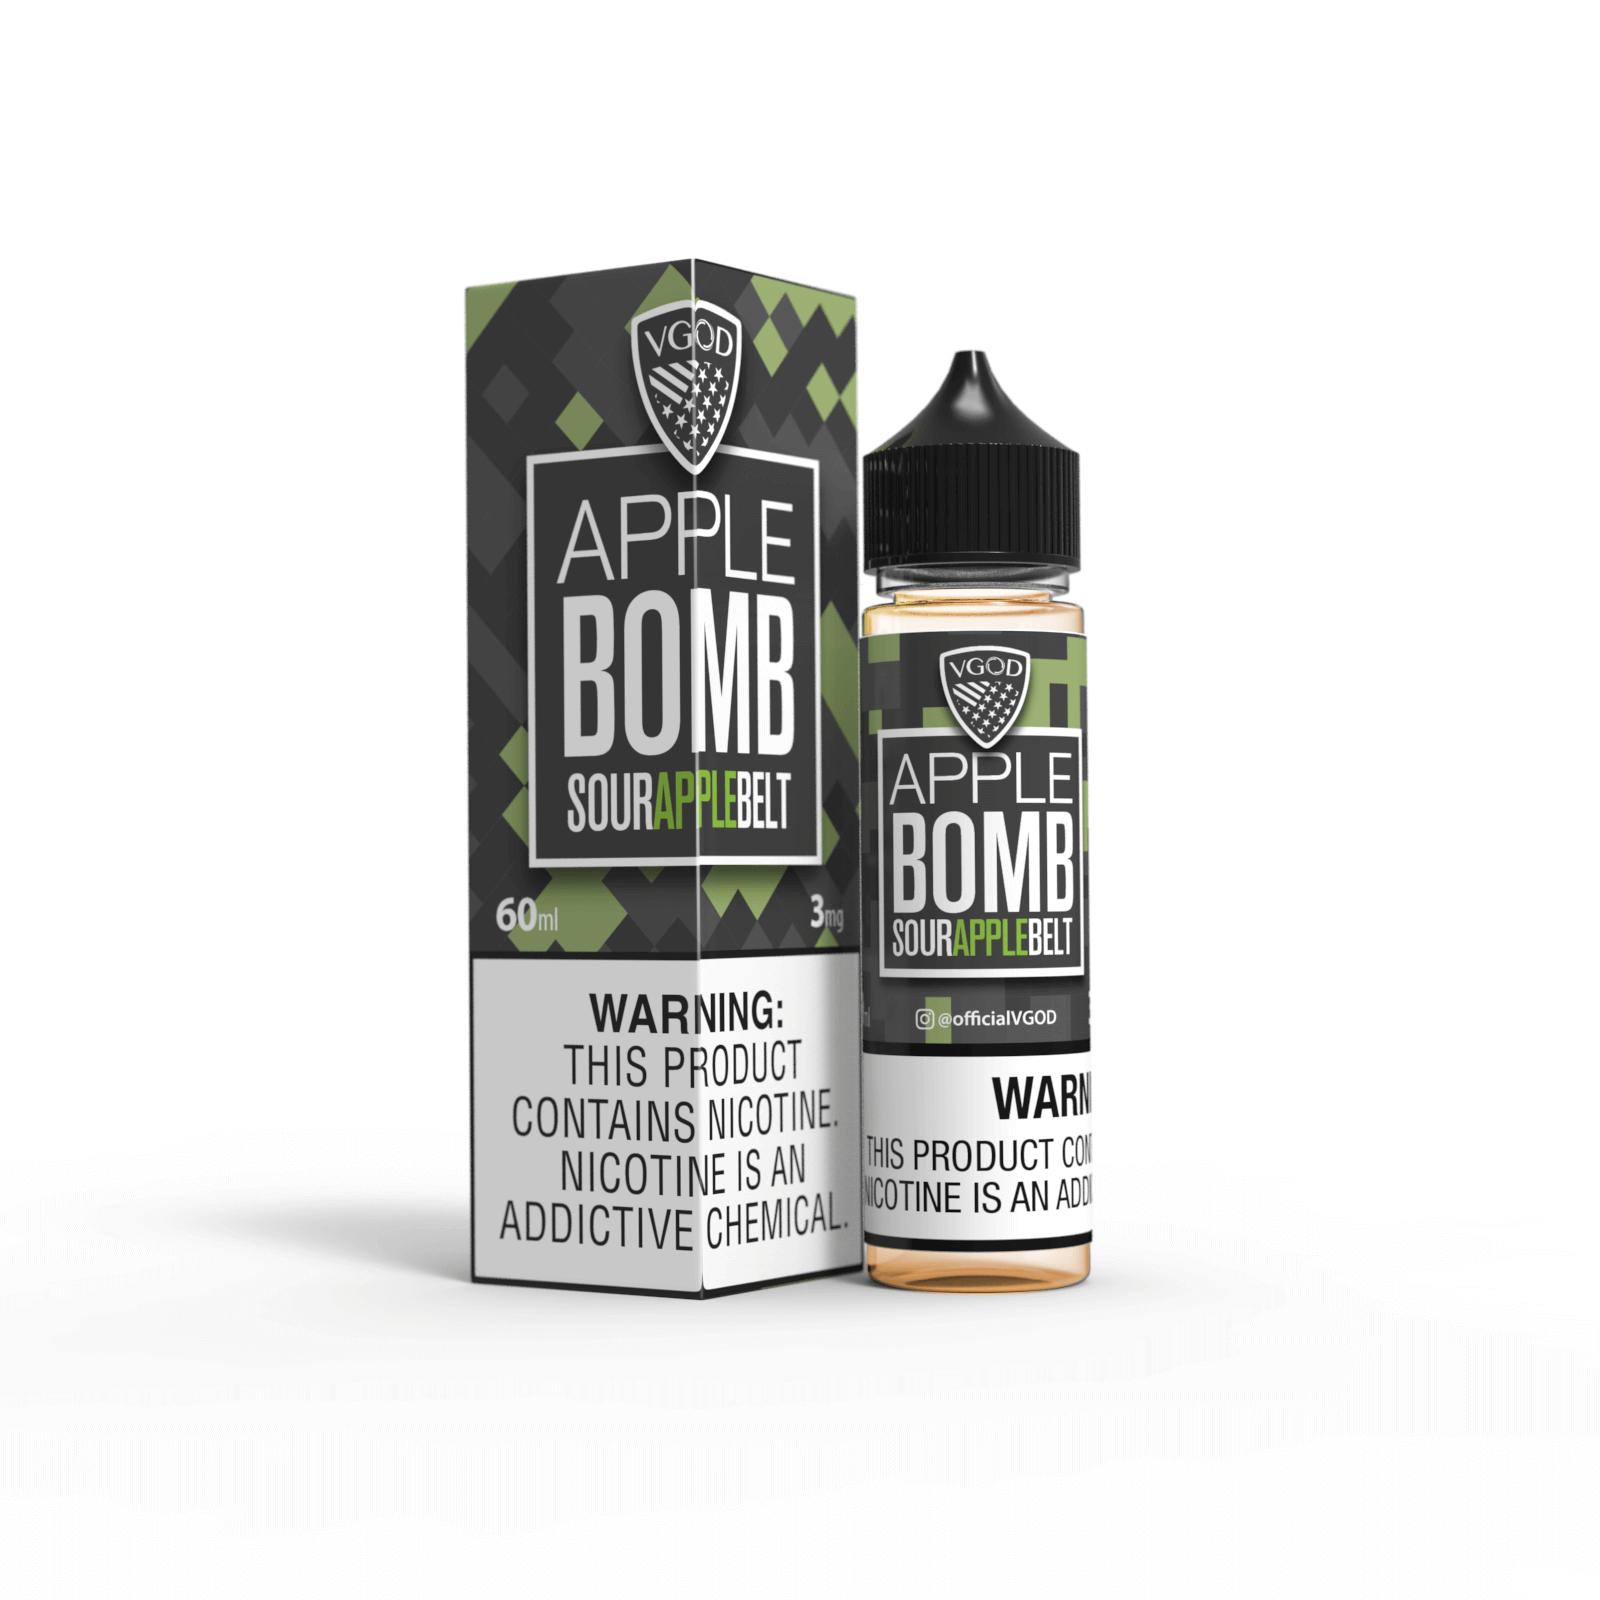 VGOD, Apple Bomb